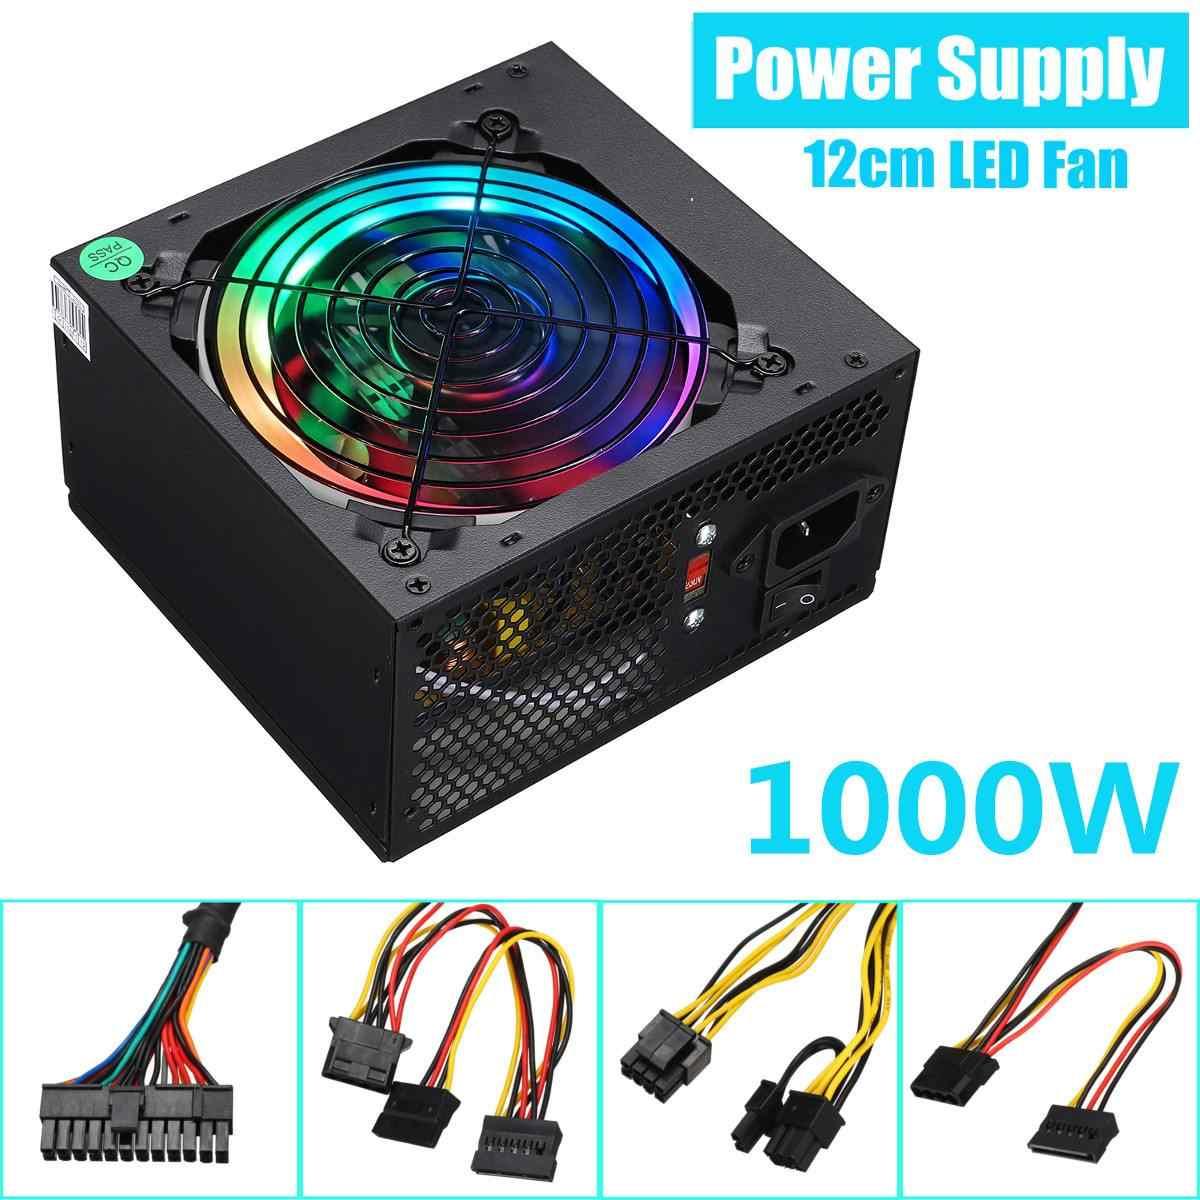 Max 1000W Power Supply PSU Silent 12 Cm LED RGB Fan ATX 24pin 12V Komputer PC SATA Game pc Power Supply untuk Intel Amd Komputer